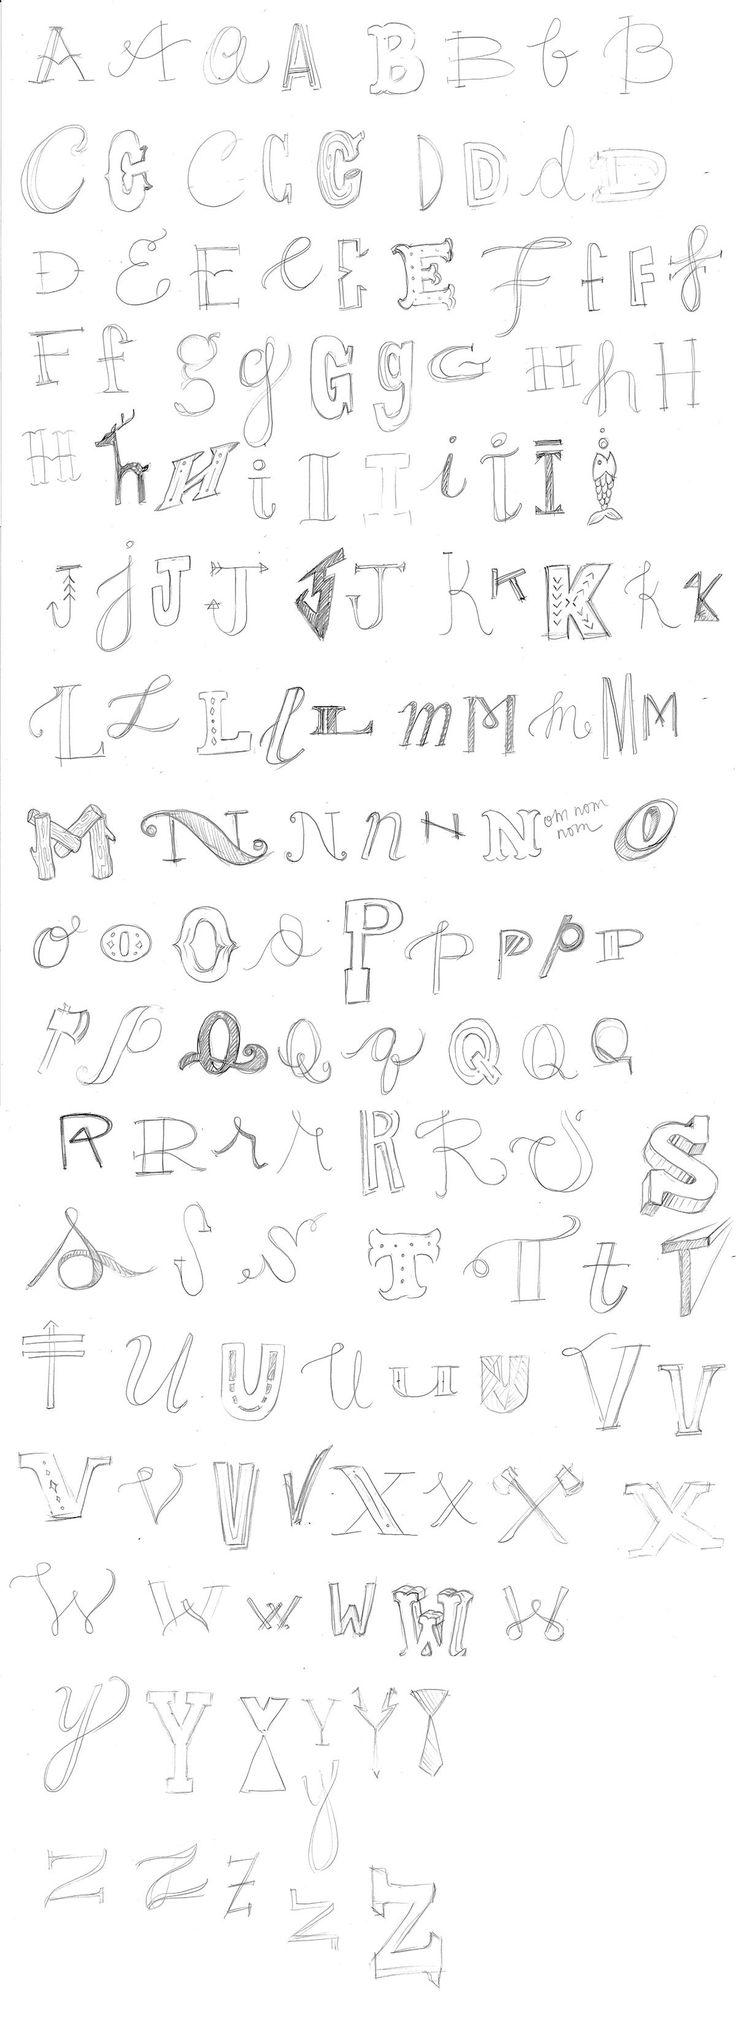 Hand-Lettering | Practice the Alphabet! by Angela Tomson – Skillshare